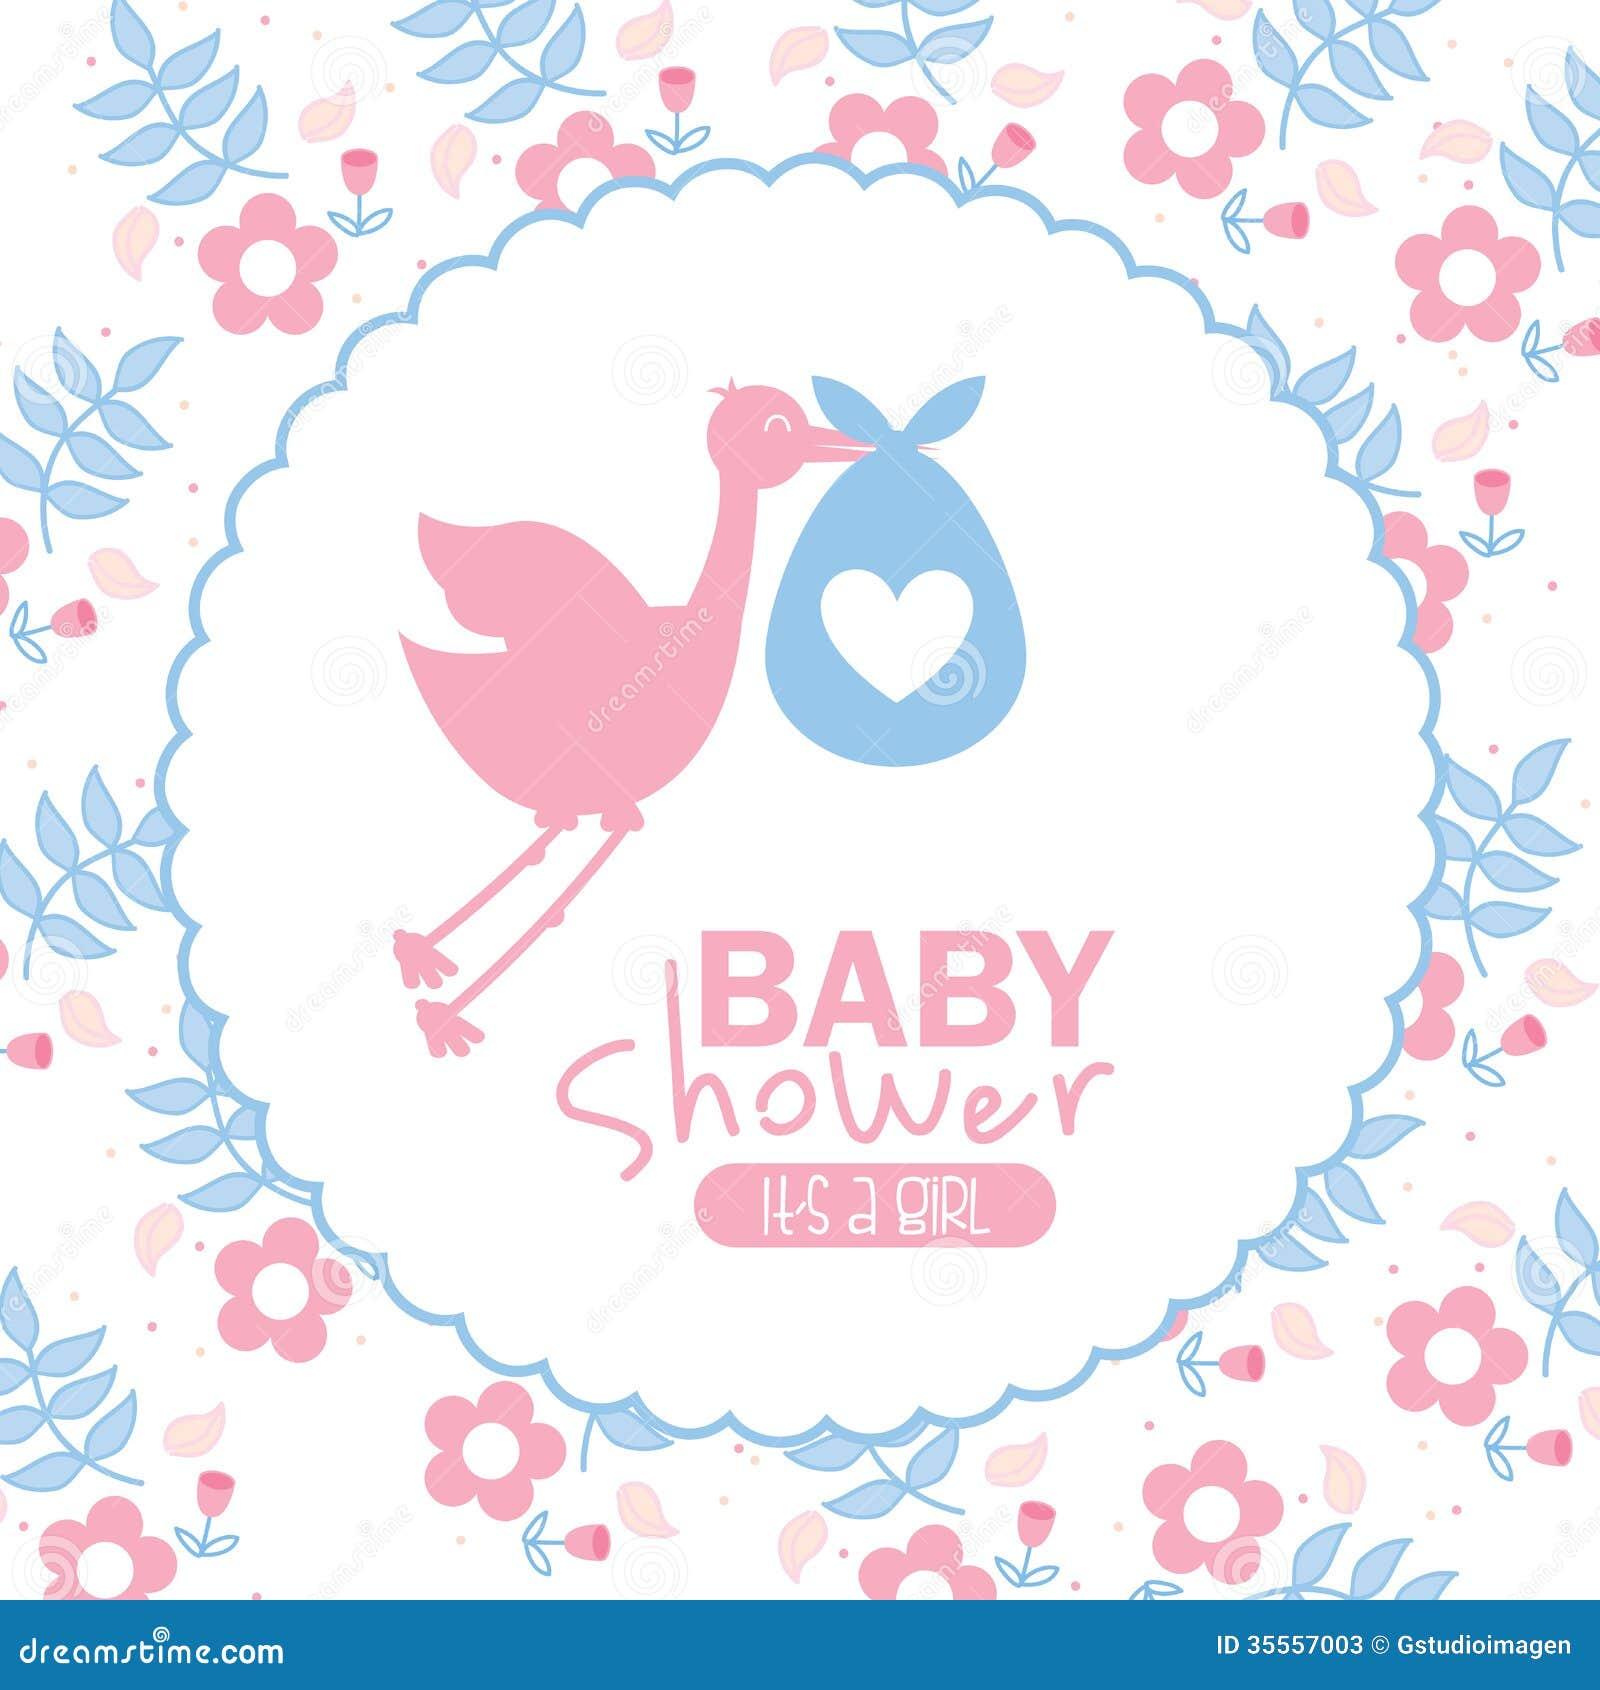 Baby shower design stock photos image 35557003